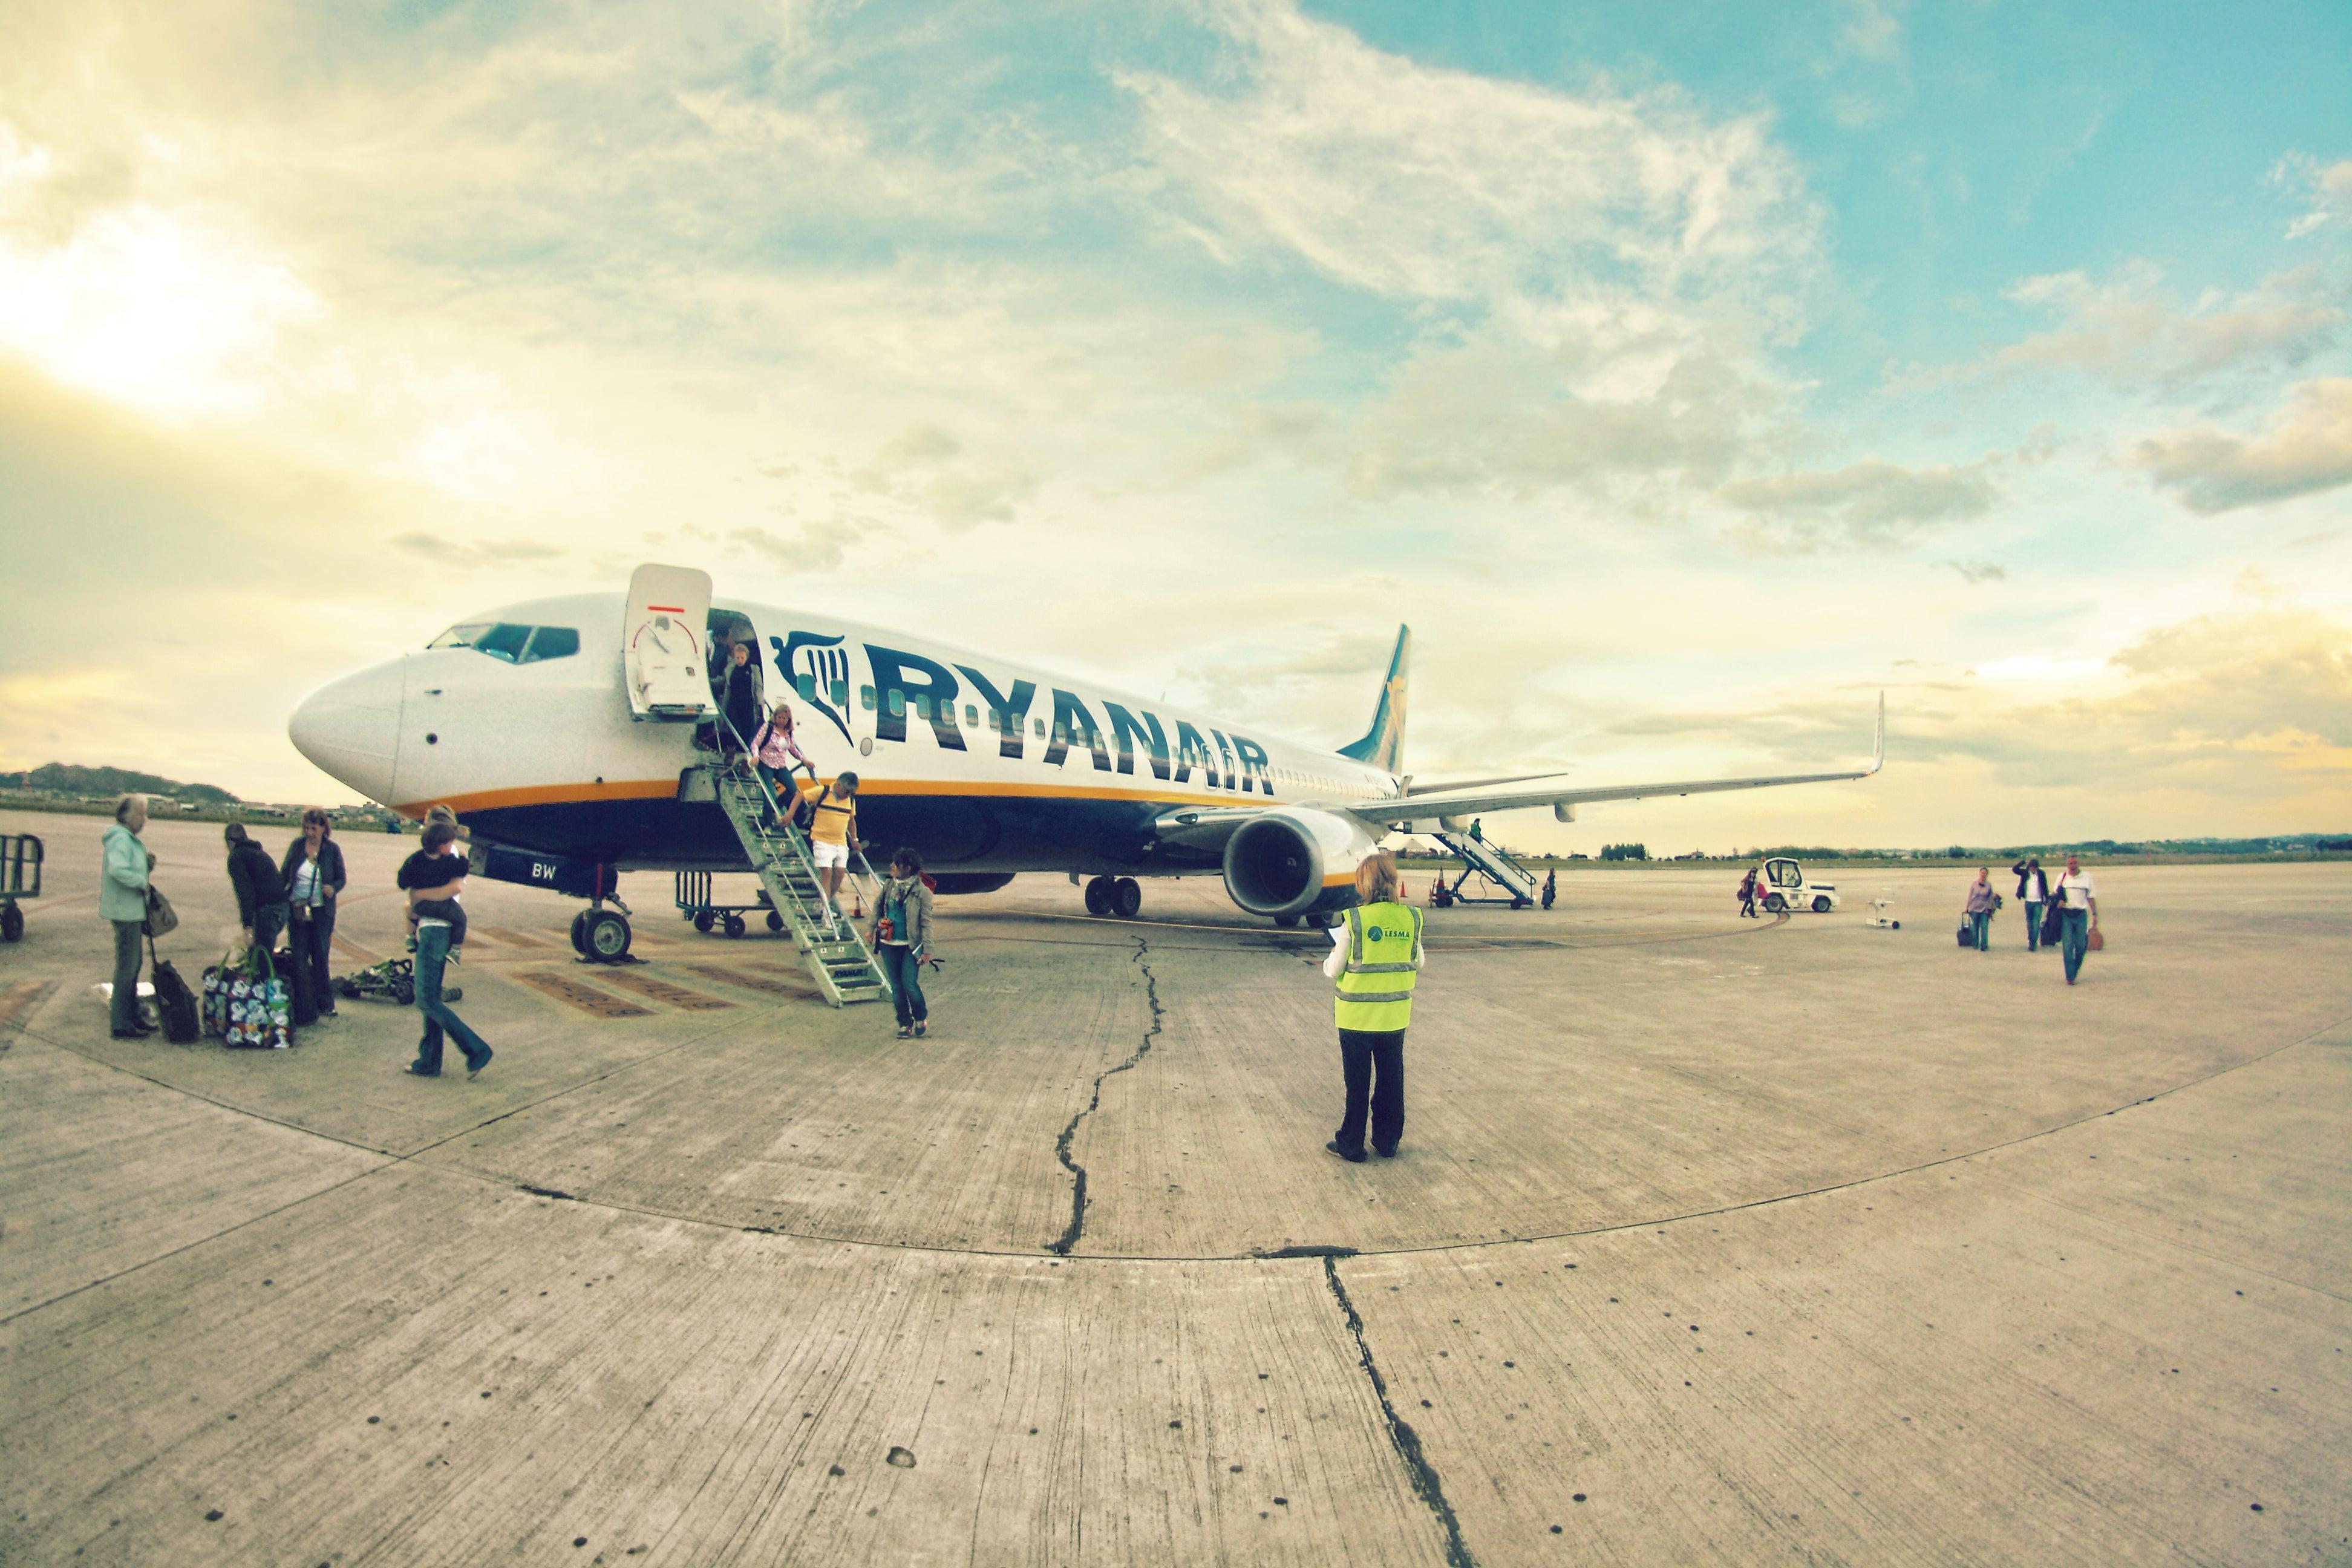 aereo ryanair check in online edreams blog di viaggi